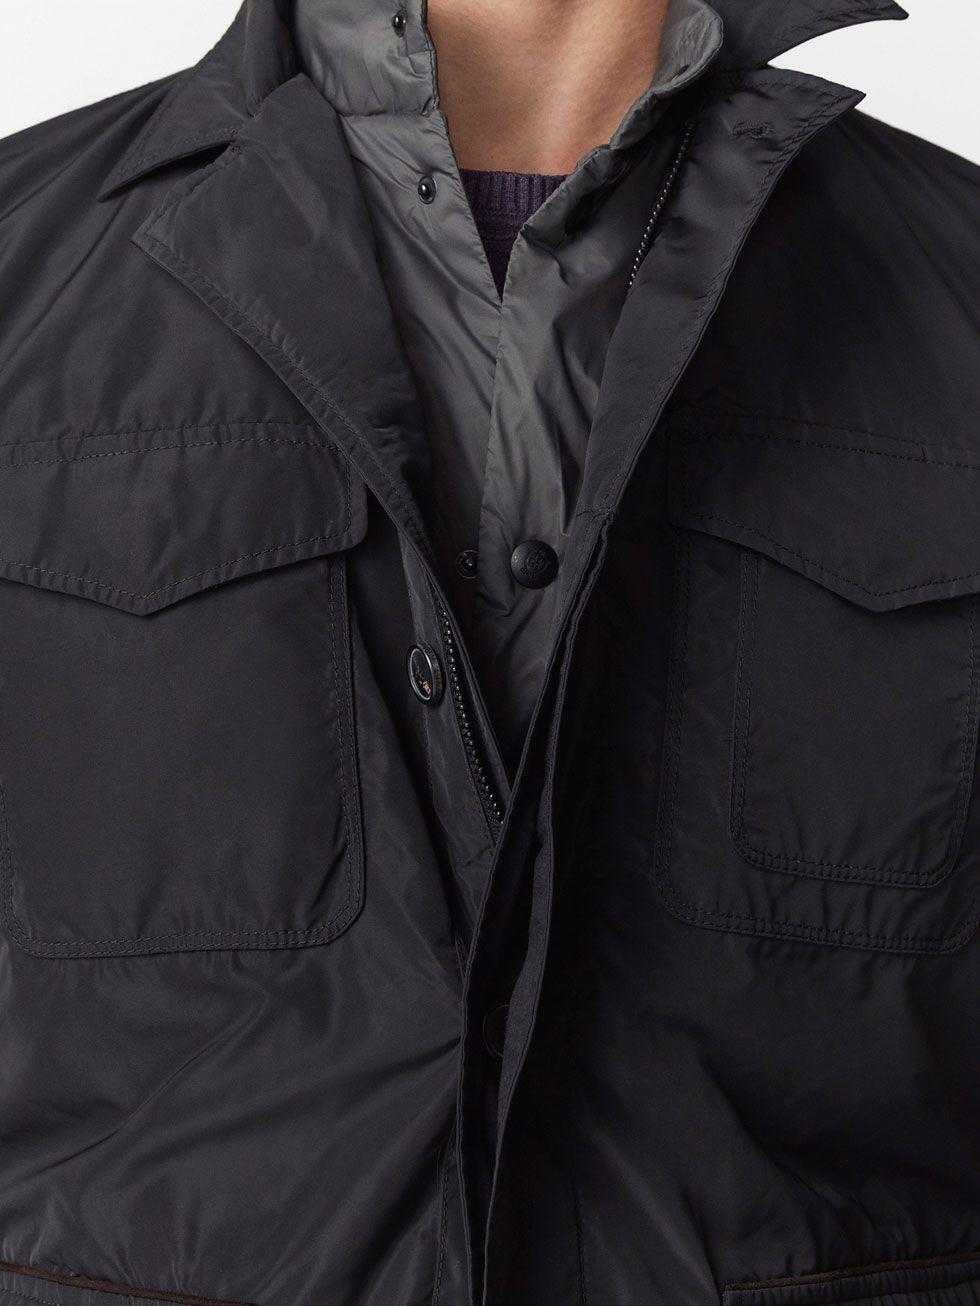 Coats & Jackets - MEN - Massimo Dutti | Massimo Dutti | Pinterest ...